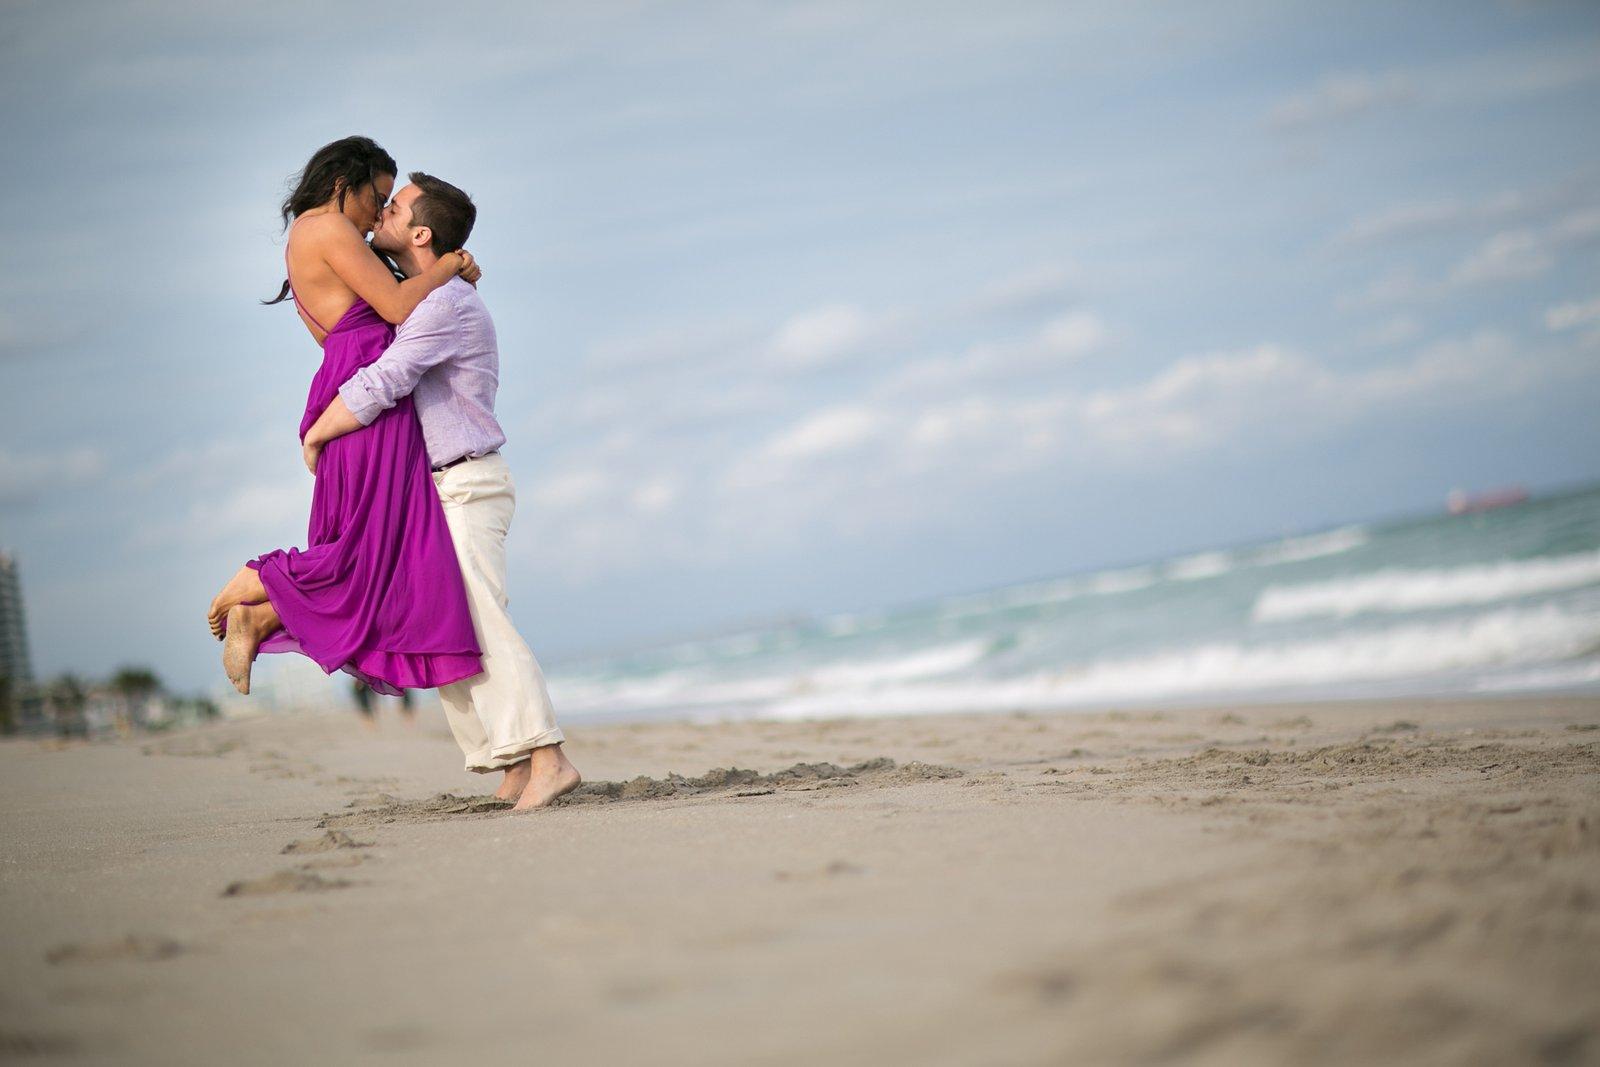 Mary Francis + Bobby, Miami Wedding Photographers | Häring Photography, Indian Wedding Photographer in Florida, Best Muslim, Hindu - South East Asian Wedding Photographers